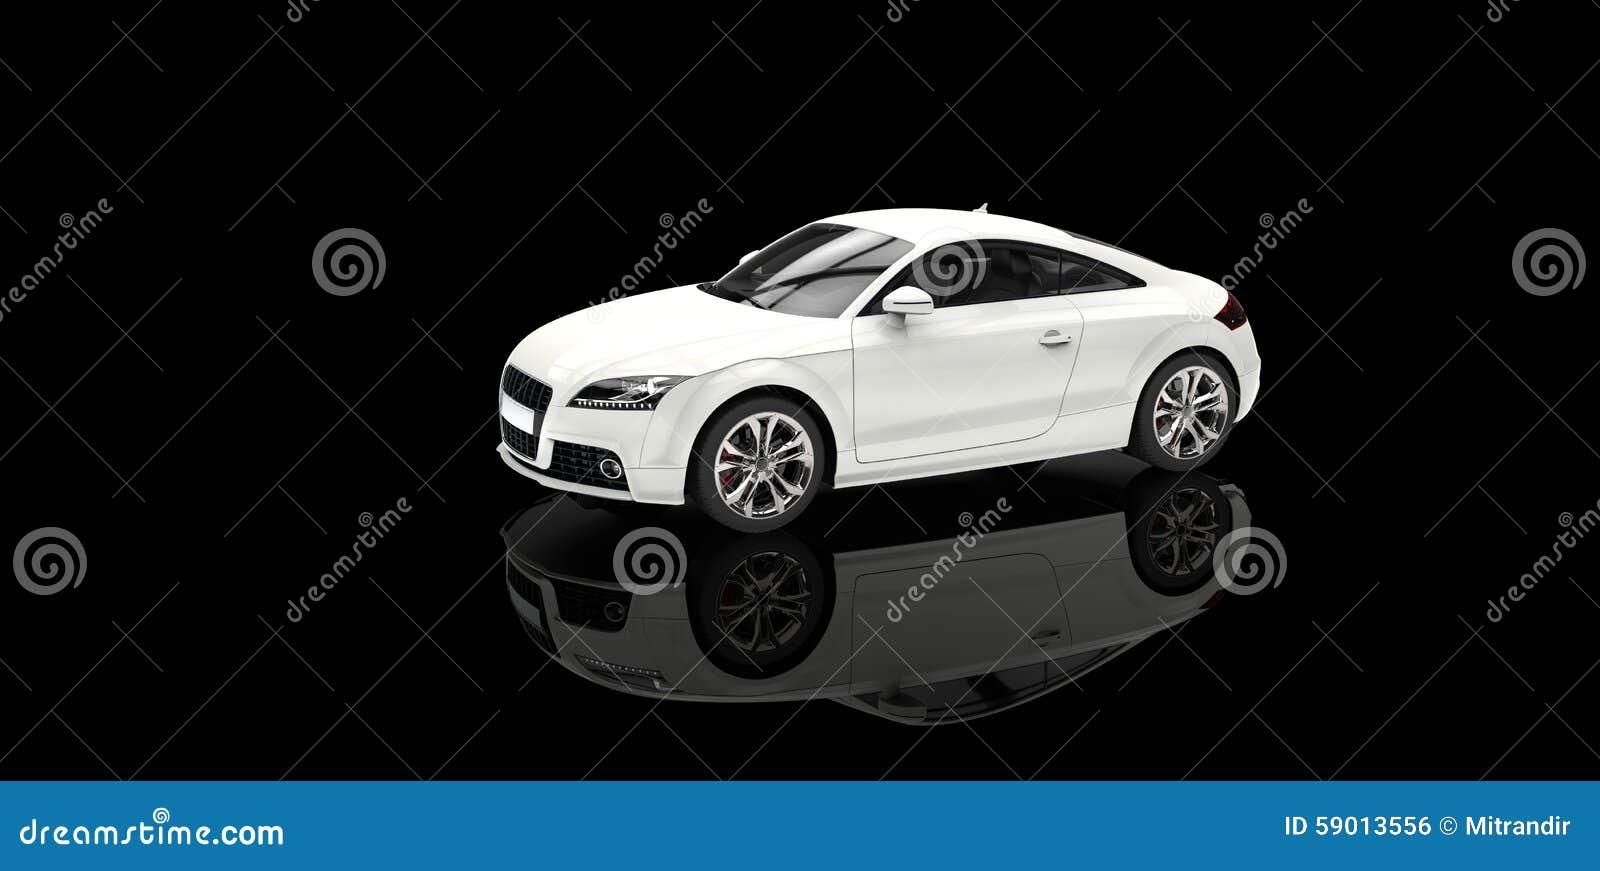 voiture blanche dans la salle d 39 exposition noire illustration stock image 59013556. Black Bedroom Furniture Sets. Home Design Ideas